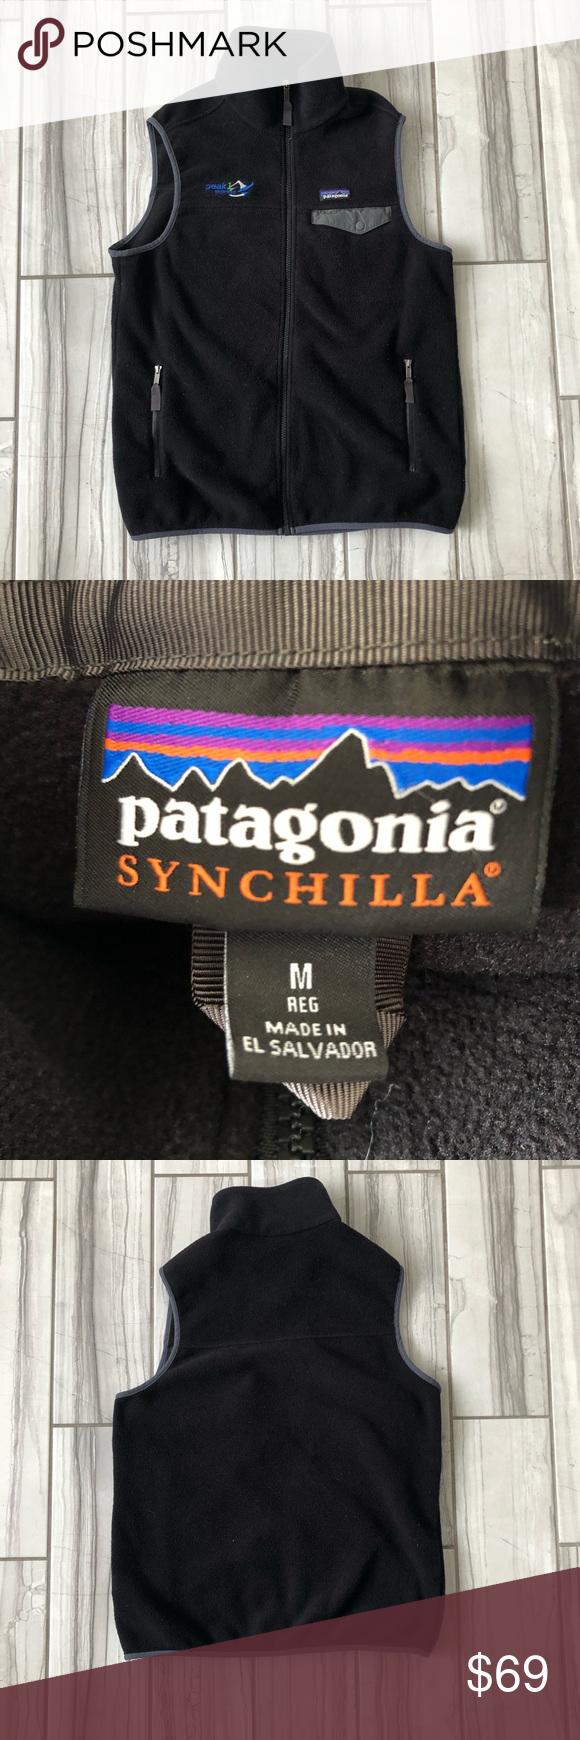 Patagonia SnapT Synchilla vest. EUC like new Patagonia